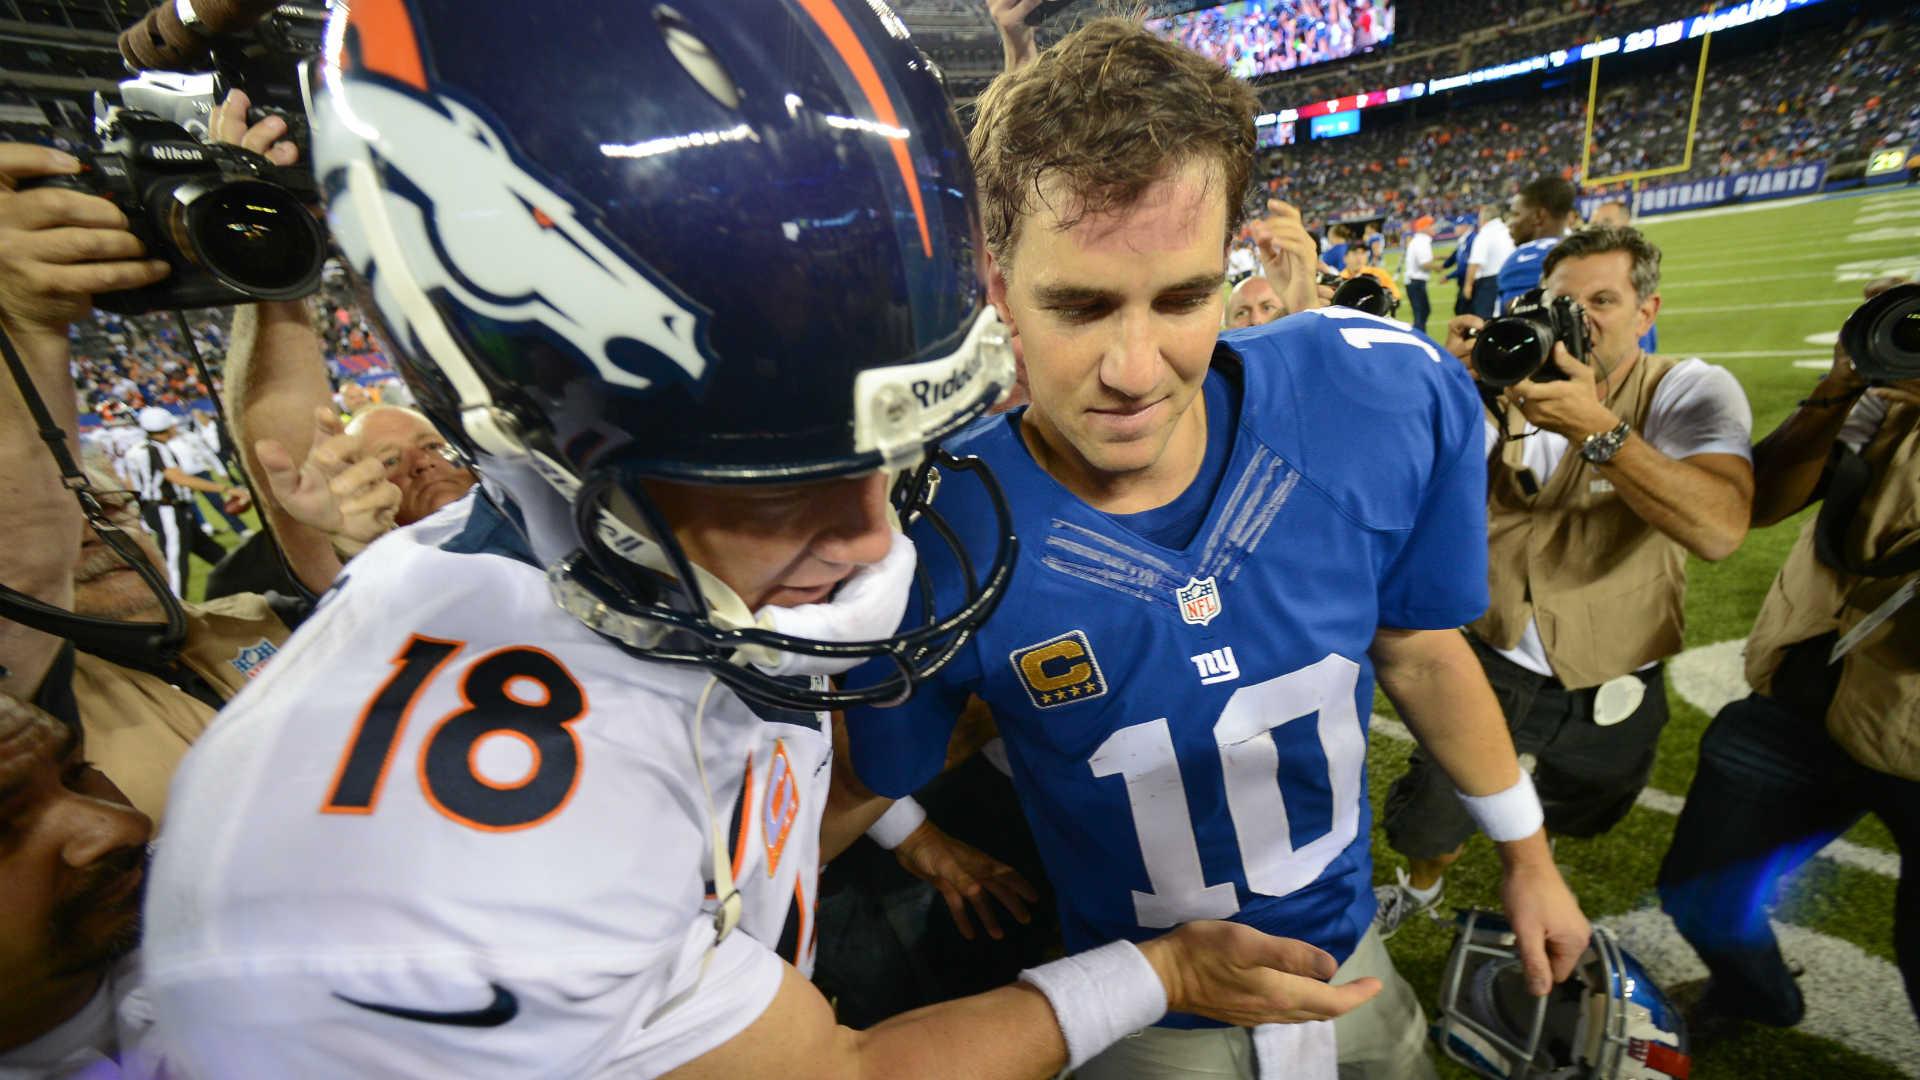 Peyton, left, and Eli Manning